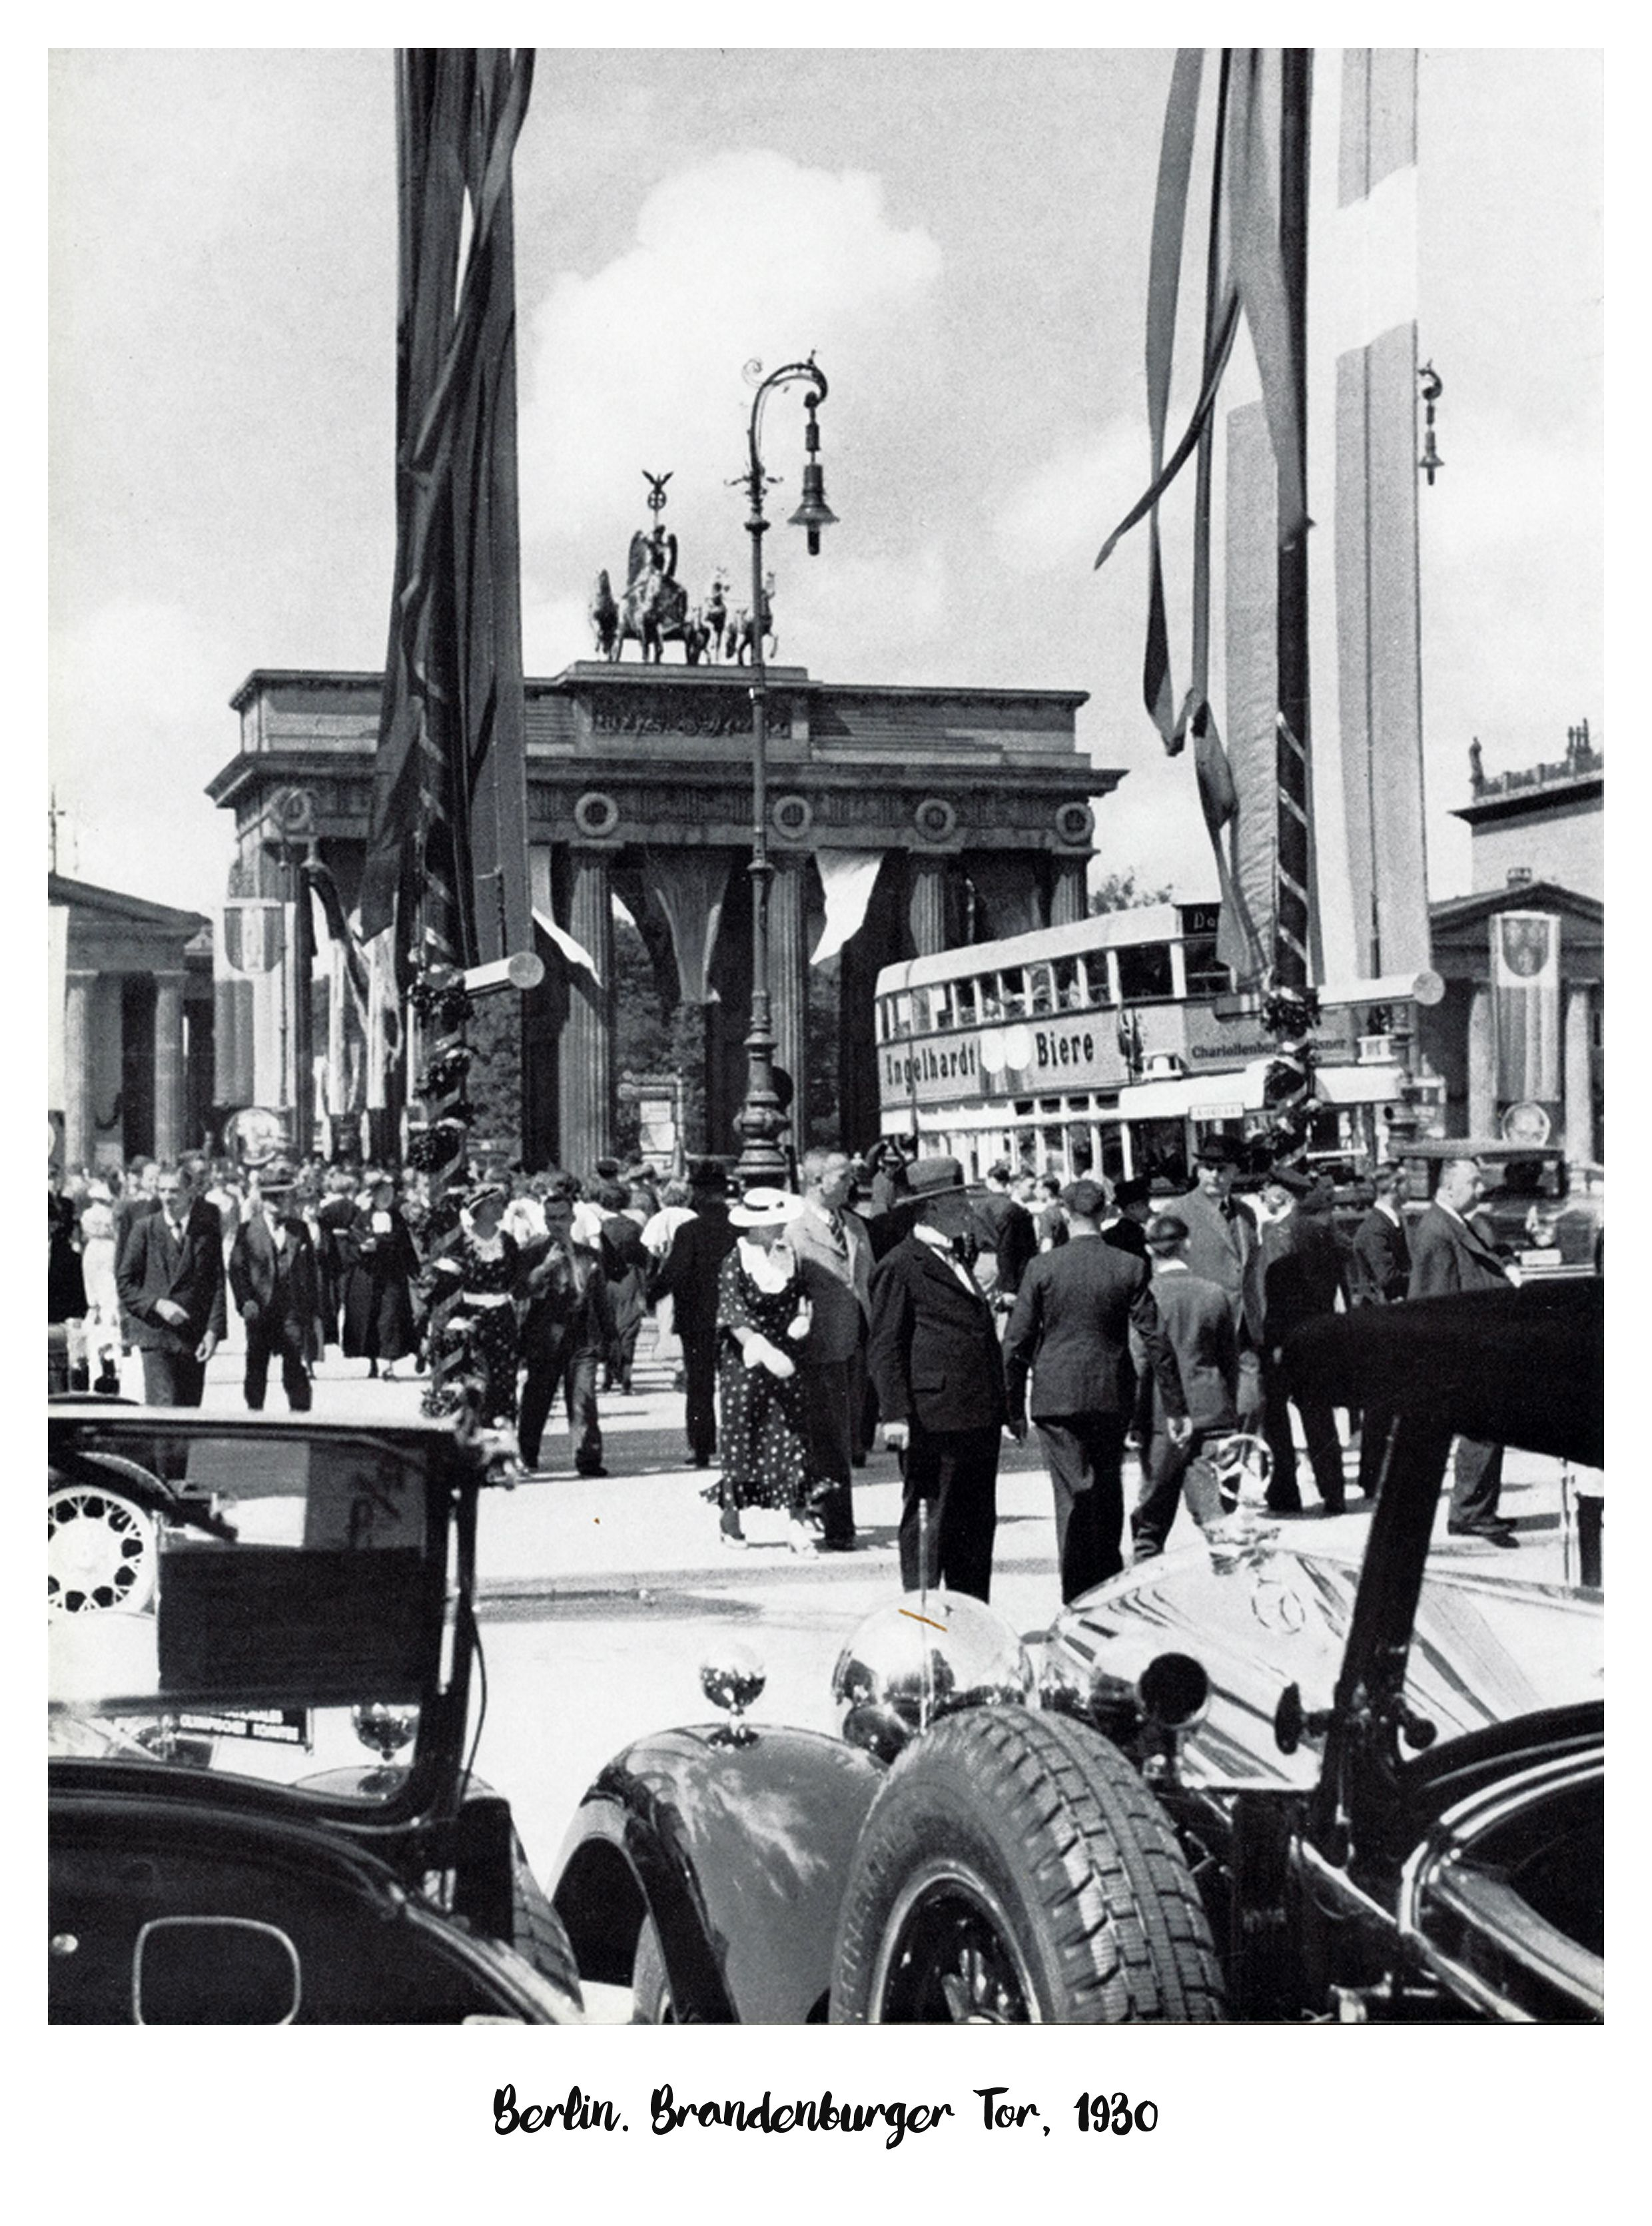 Berlin Brandenburger Tor 1930 Brandenburger Tor Berlin Geschichte Brandenburger Tor Berlin